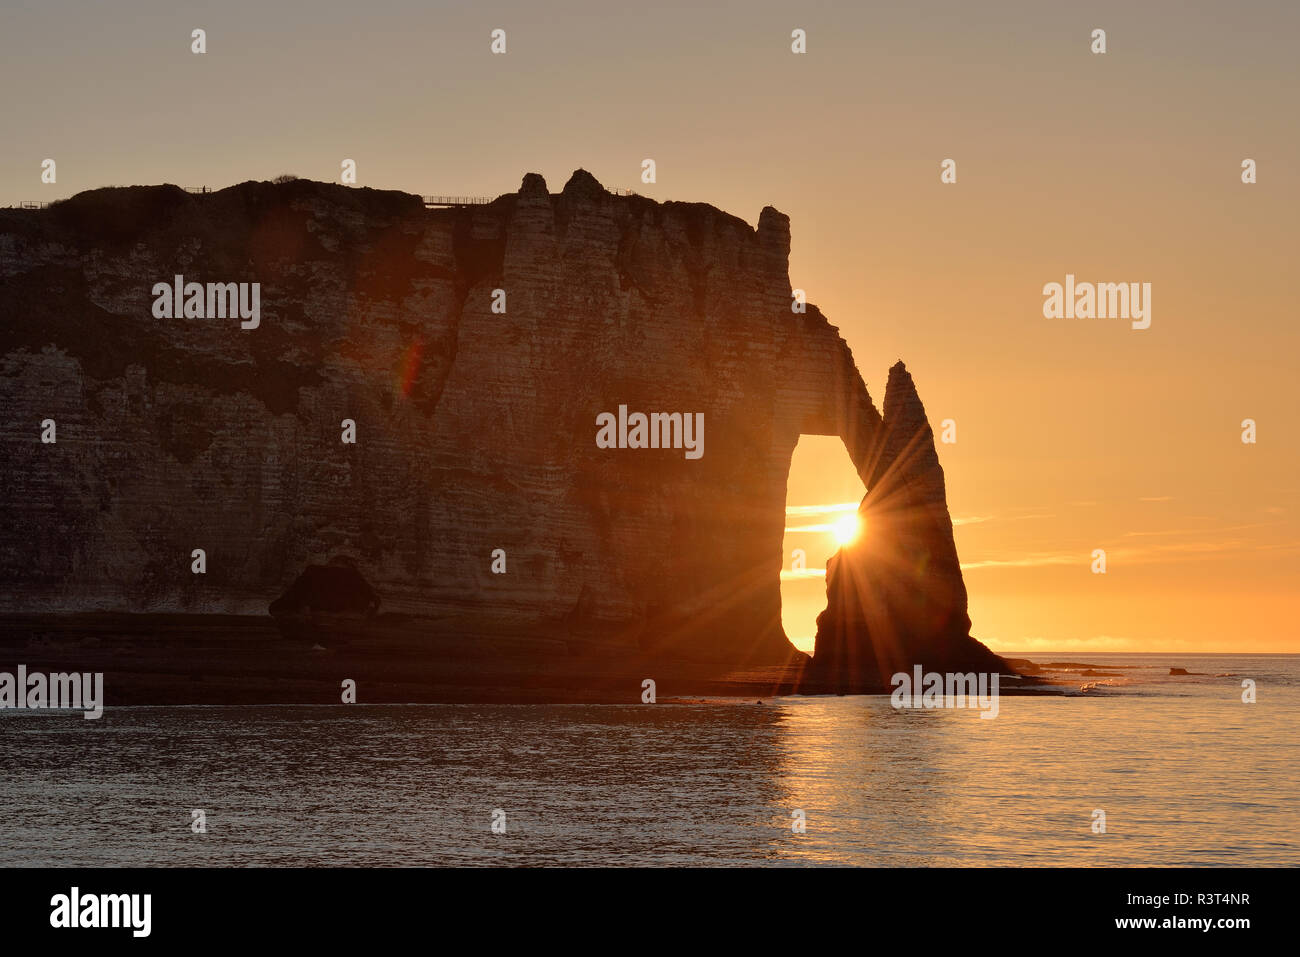 France, Normandy, Cote d'Albatre, rock coast of Etretat by sunset - Stock Image